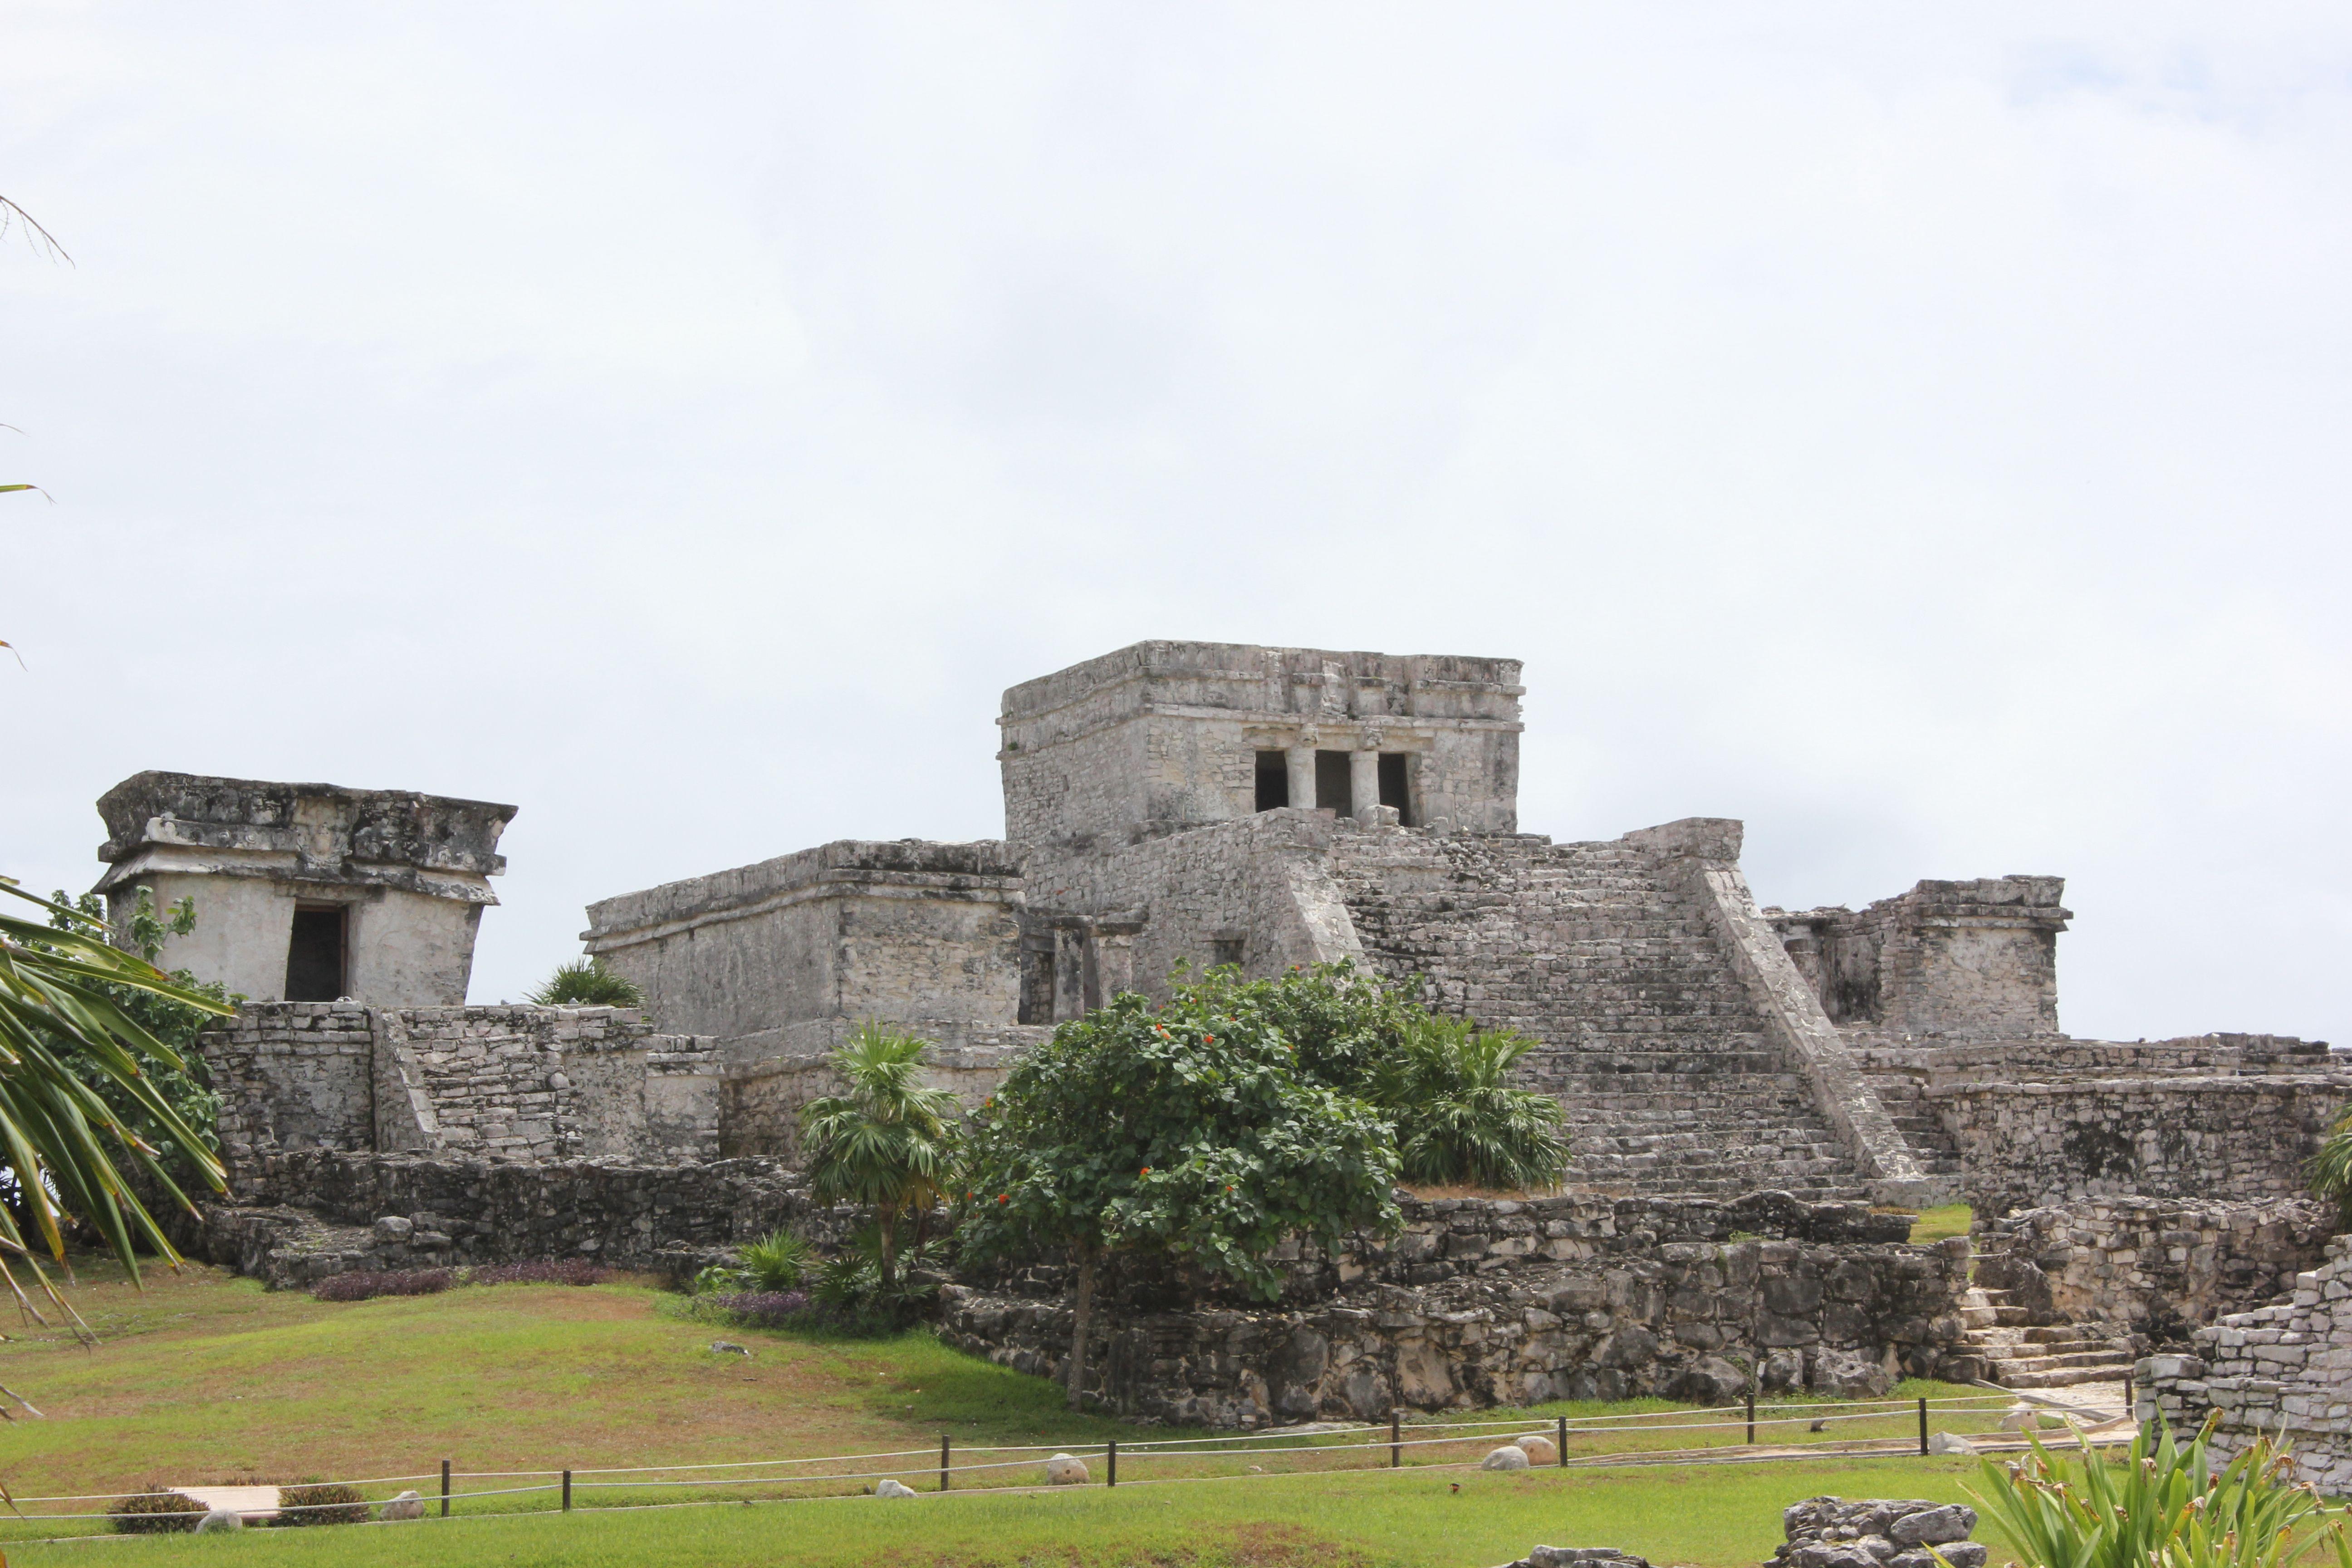 Meksikanske Ruins Aztec - Maya Oldtidsruiner i Mexico